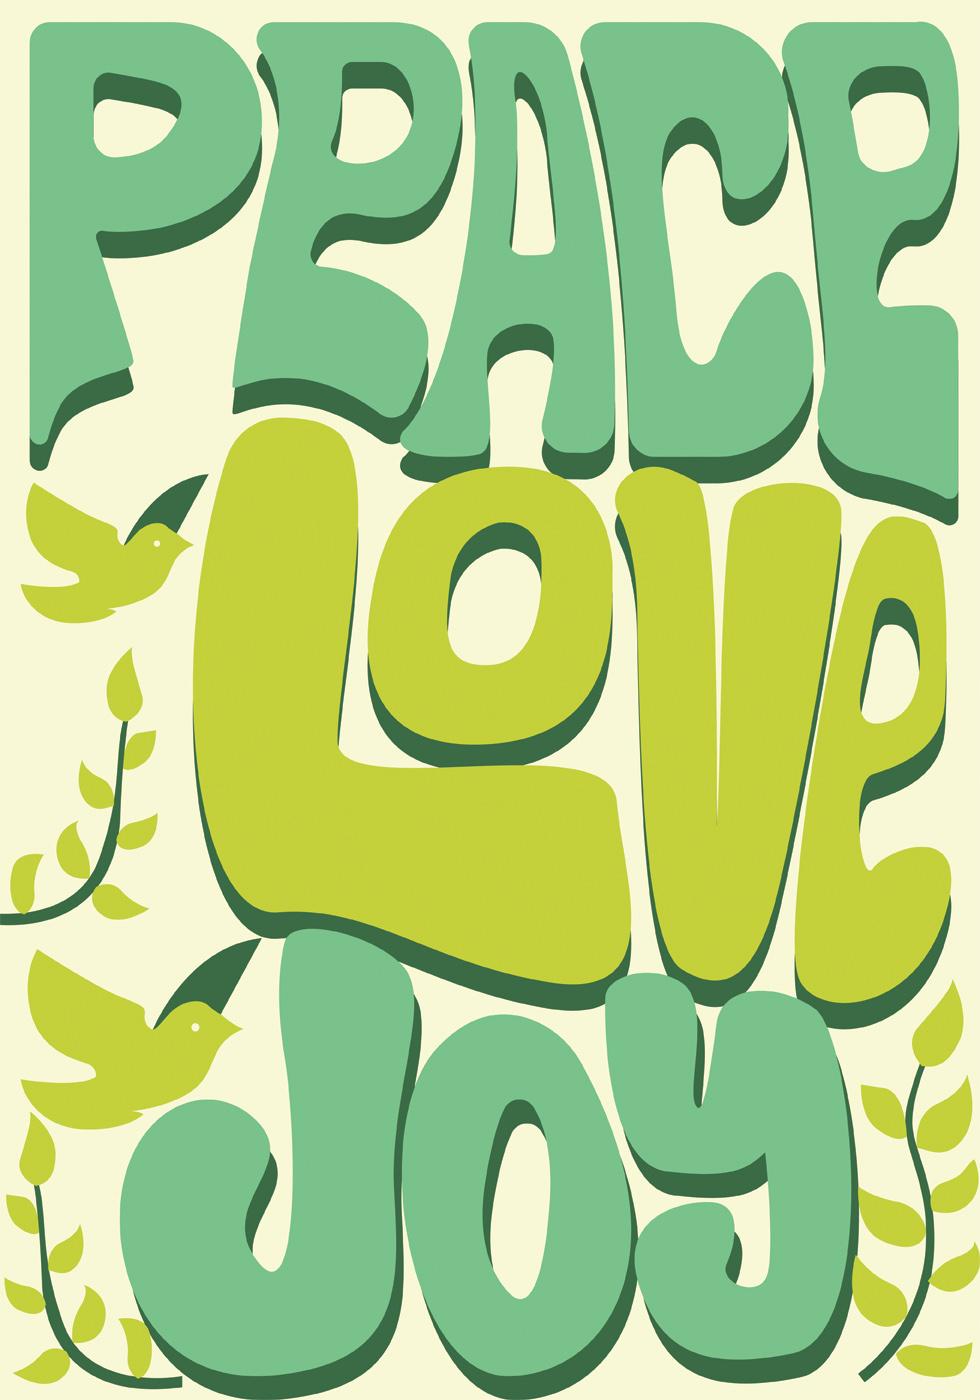 peace  love  and joy vector design